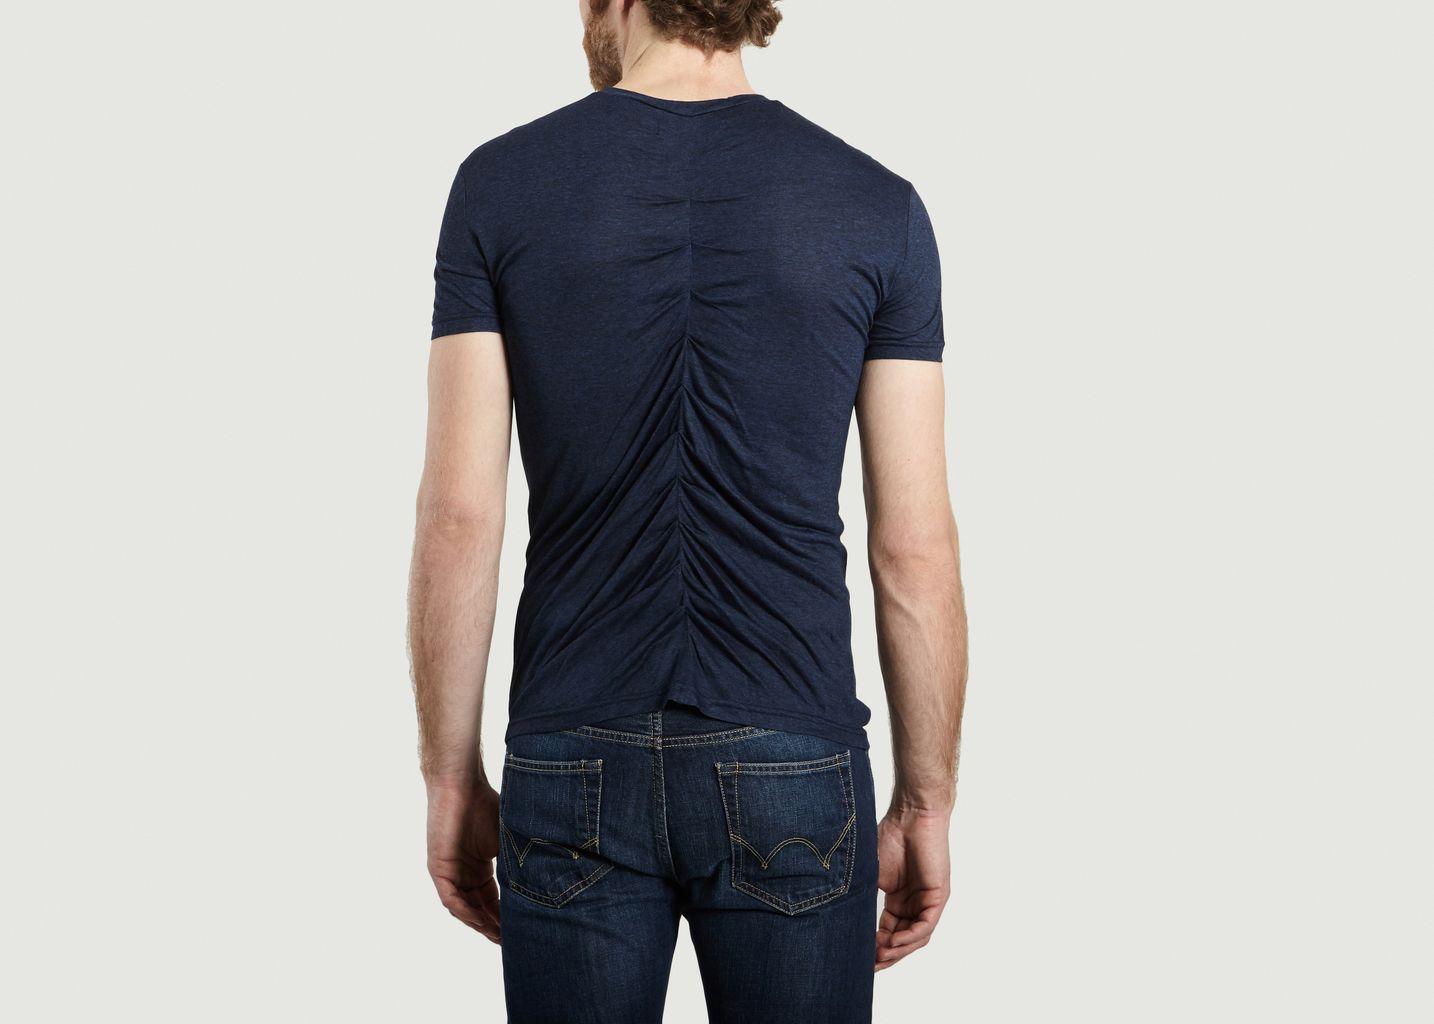 T-Shirt Vertébral Court - Sébastien Blondin